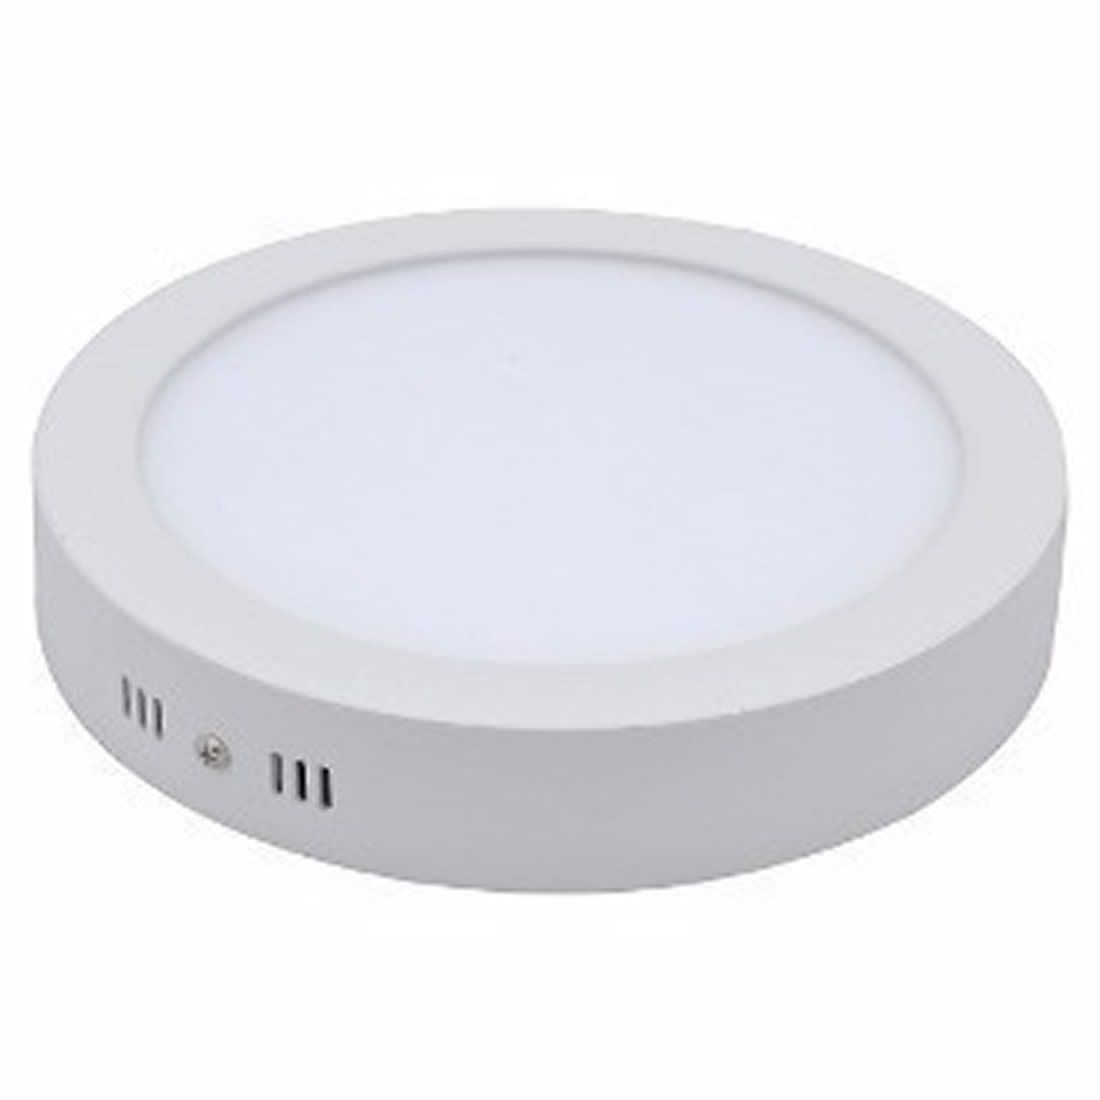 Luminária Ourolux Plafon Led Sobrepor Redondo Bivolt 24W Luz Branca 6400K